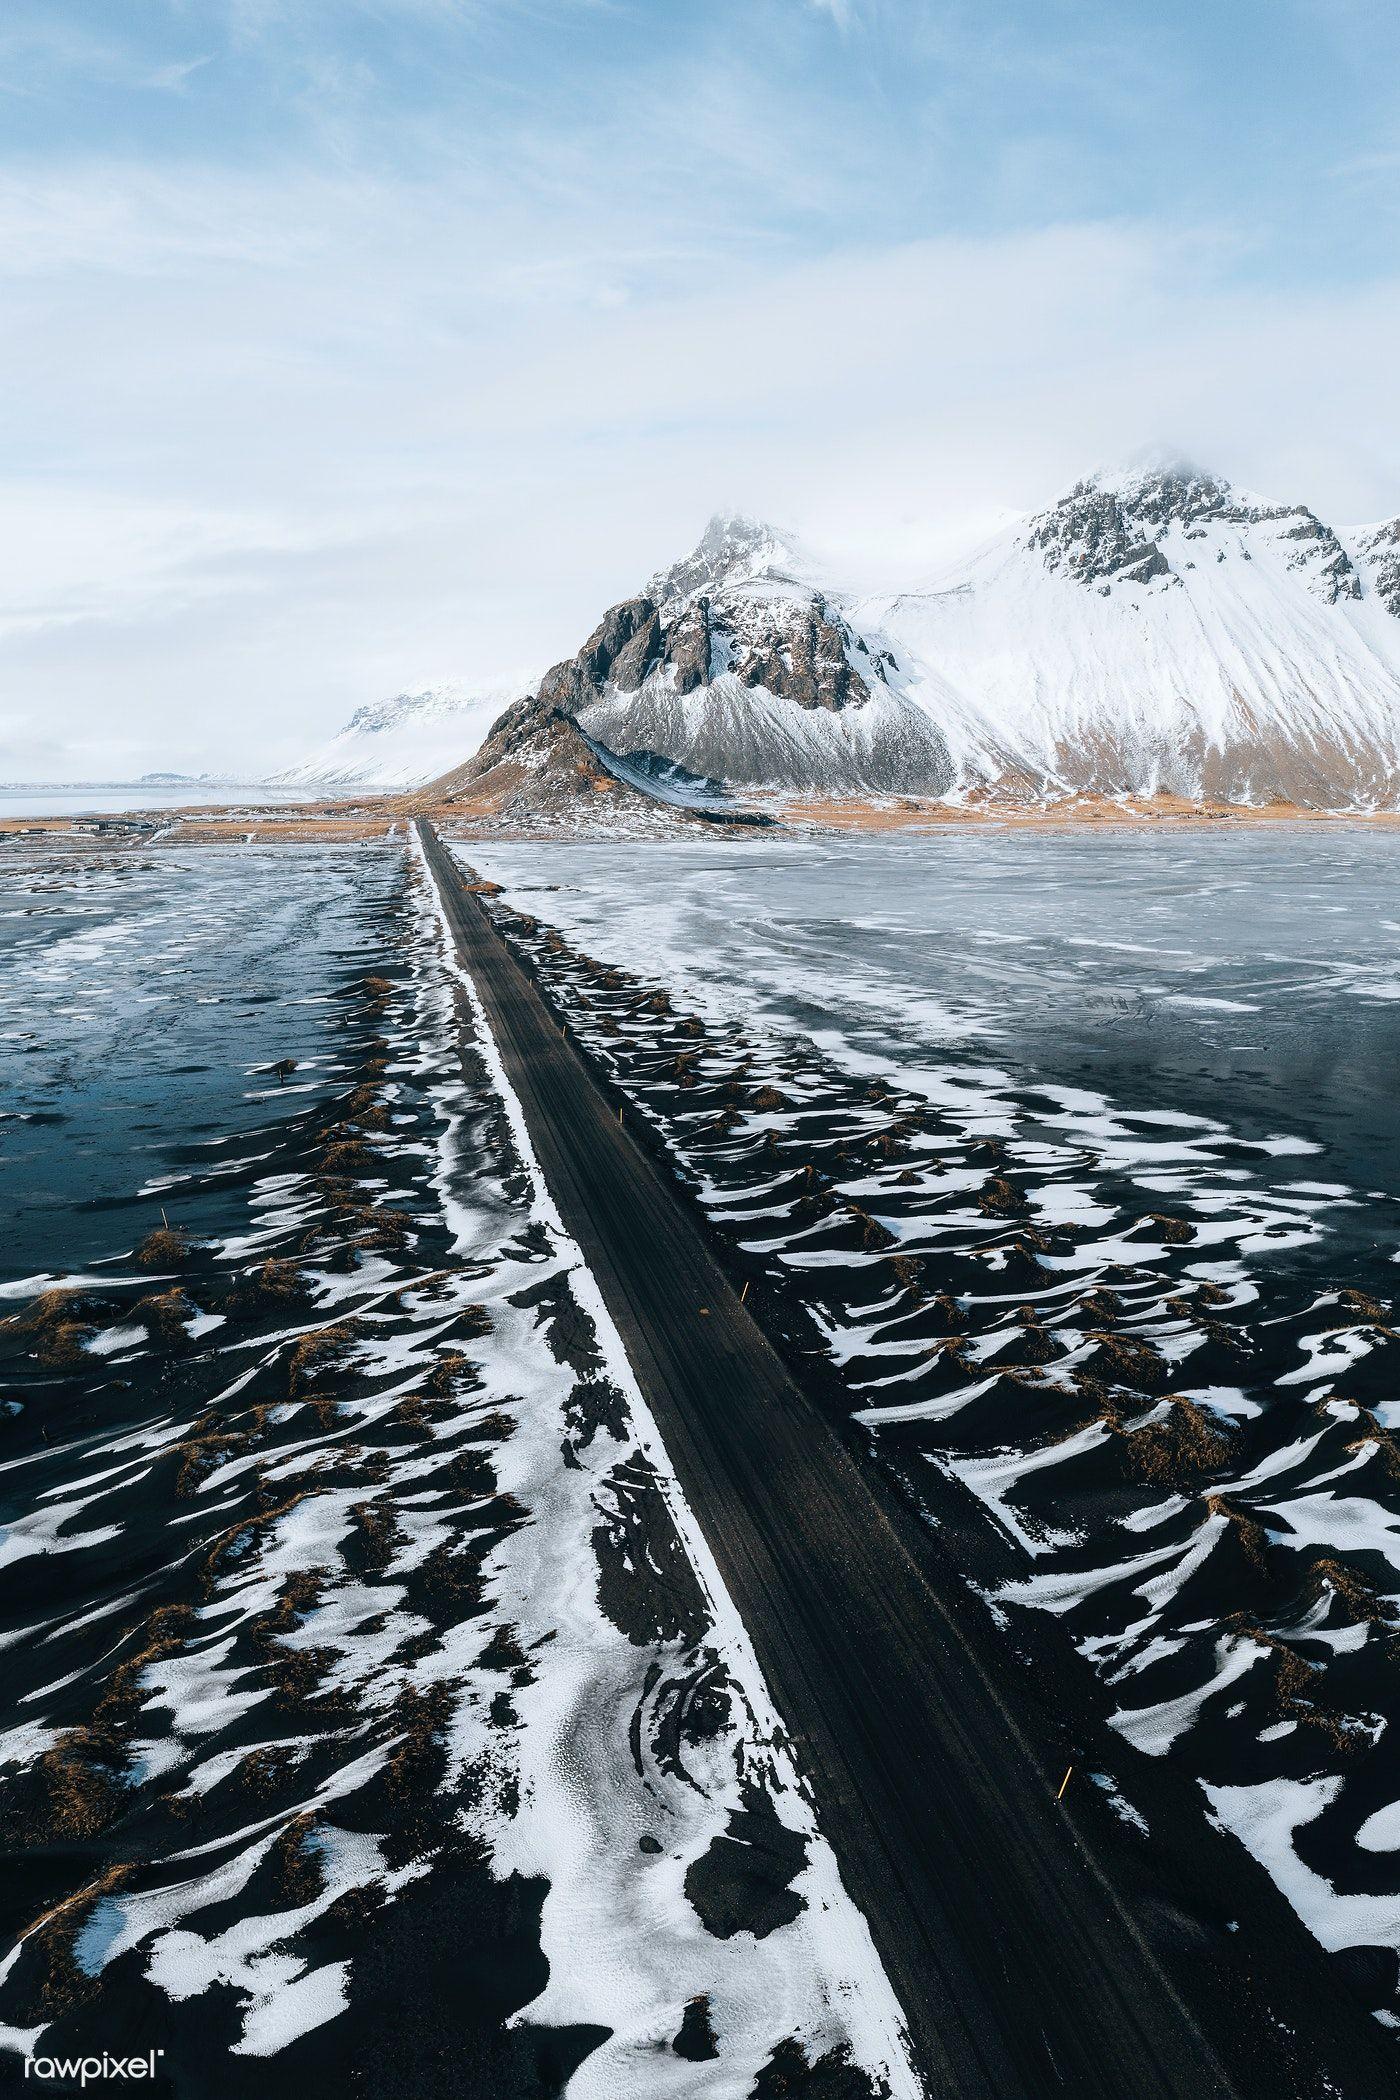 Download premium image of road through stokksnes on